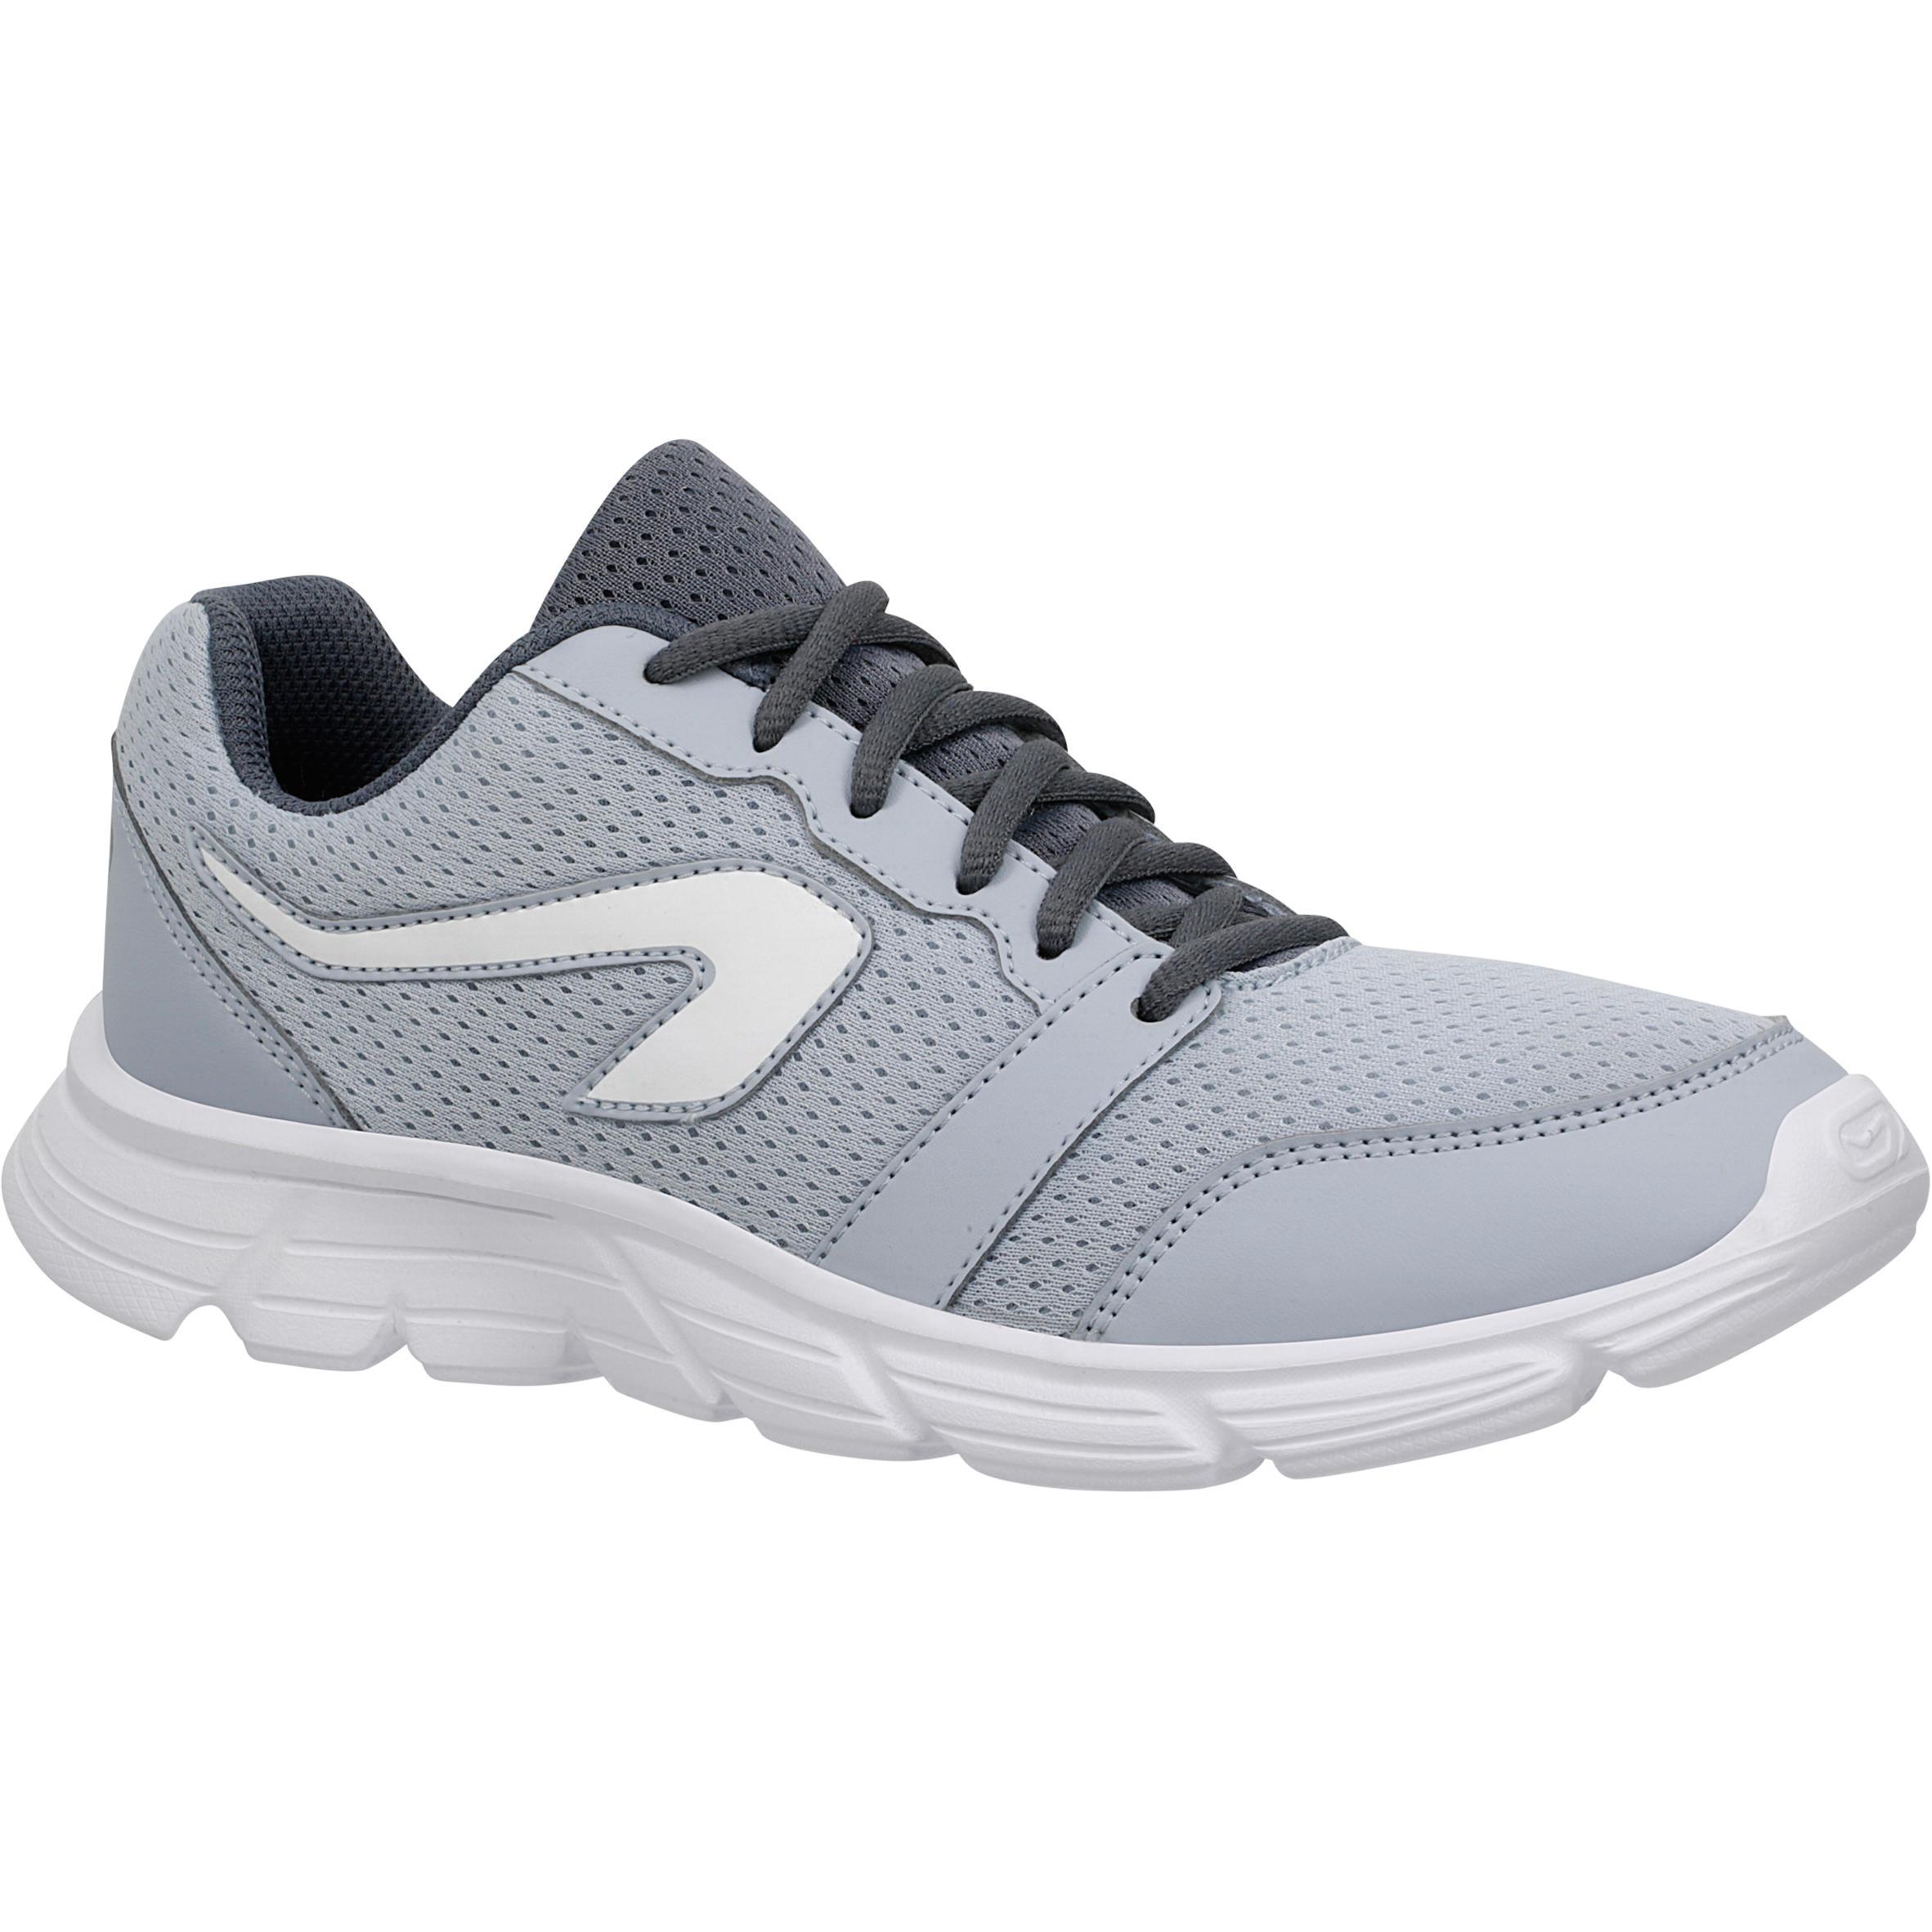 b43dbe73f7814 Comprar Zapatillas de running para correr mujer